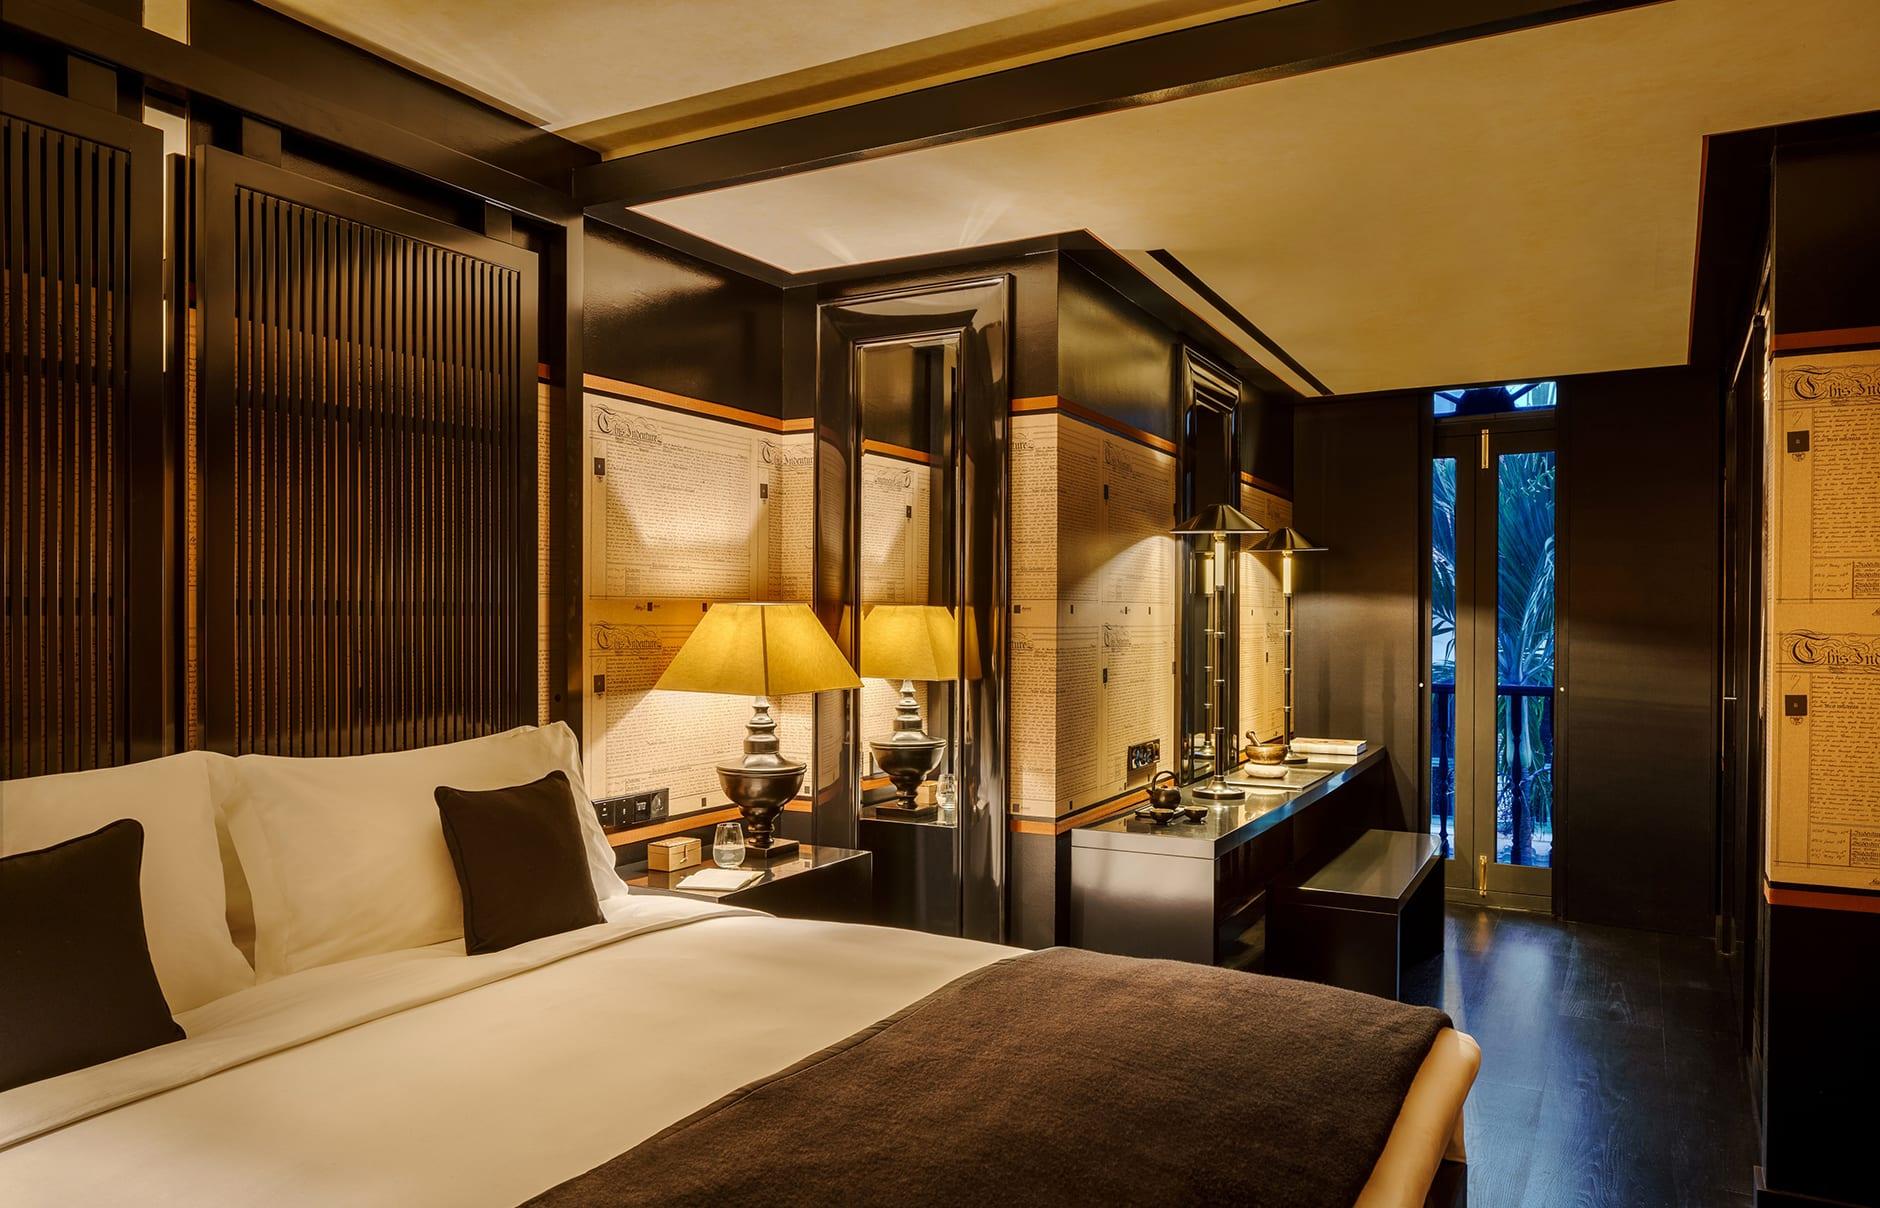 Six Senses Duxton, Singapore. Montgomerie Suite Bedroom. Luxury Hotel Review by TravelPlusStyle. Photo © Six Senses Hotels Resorts Spas